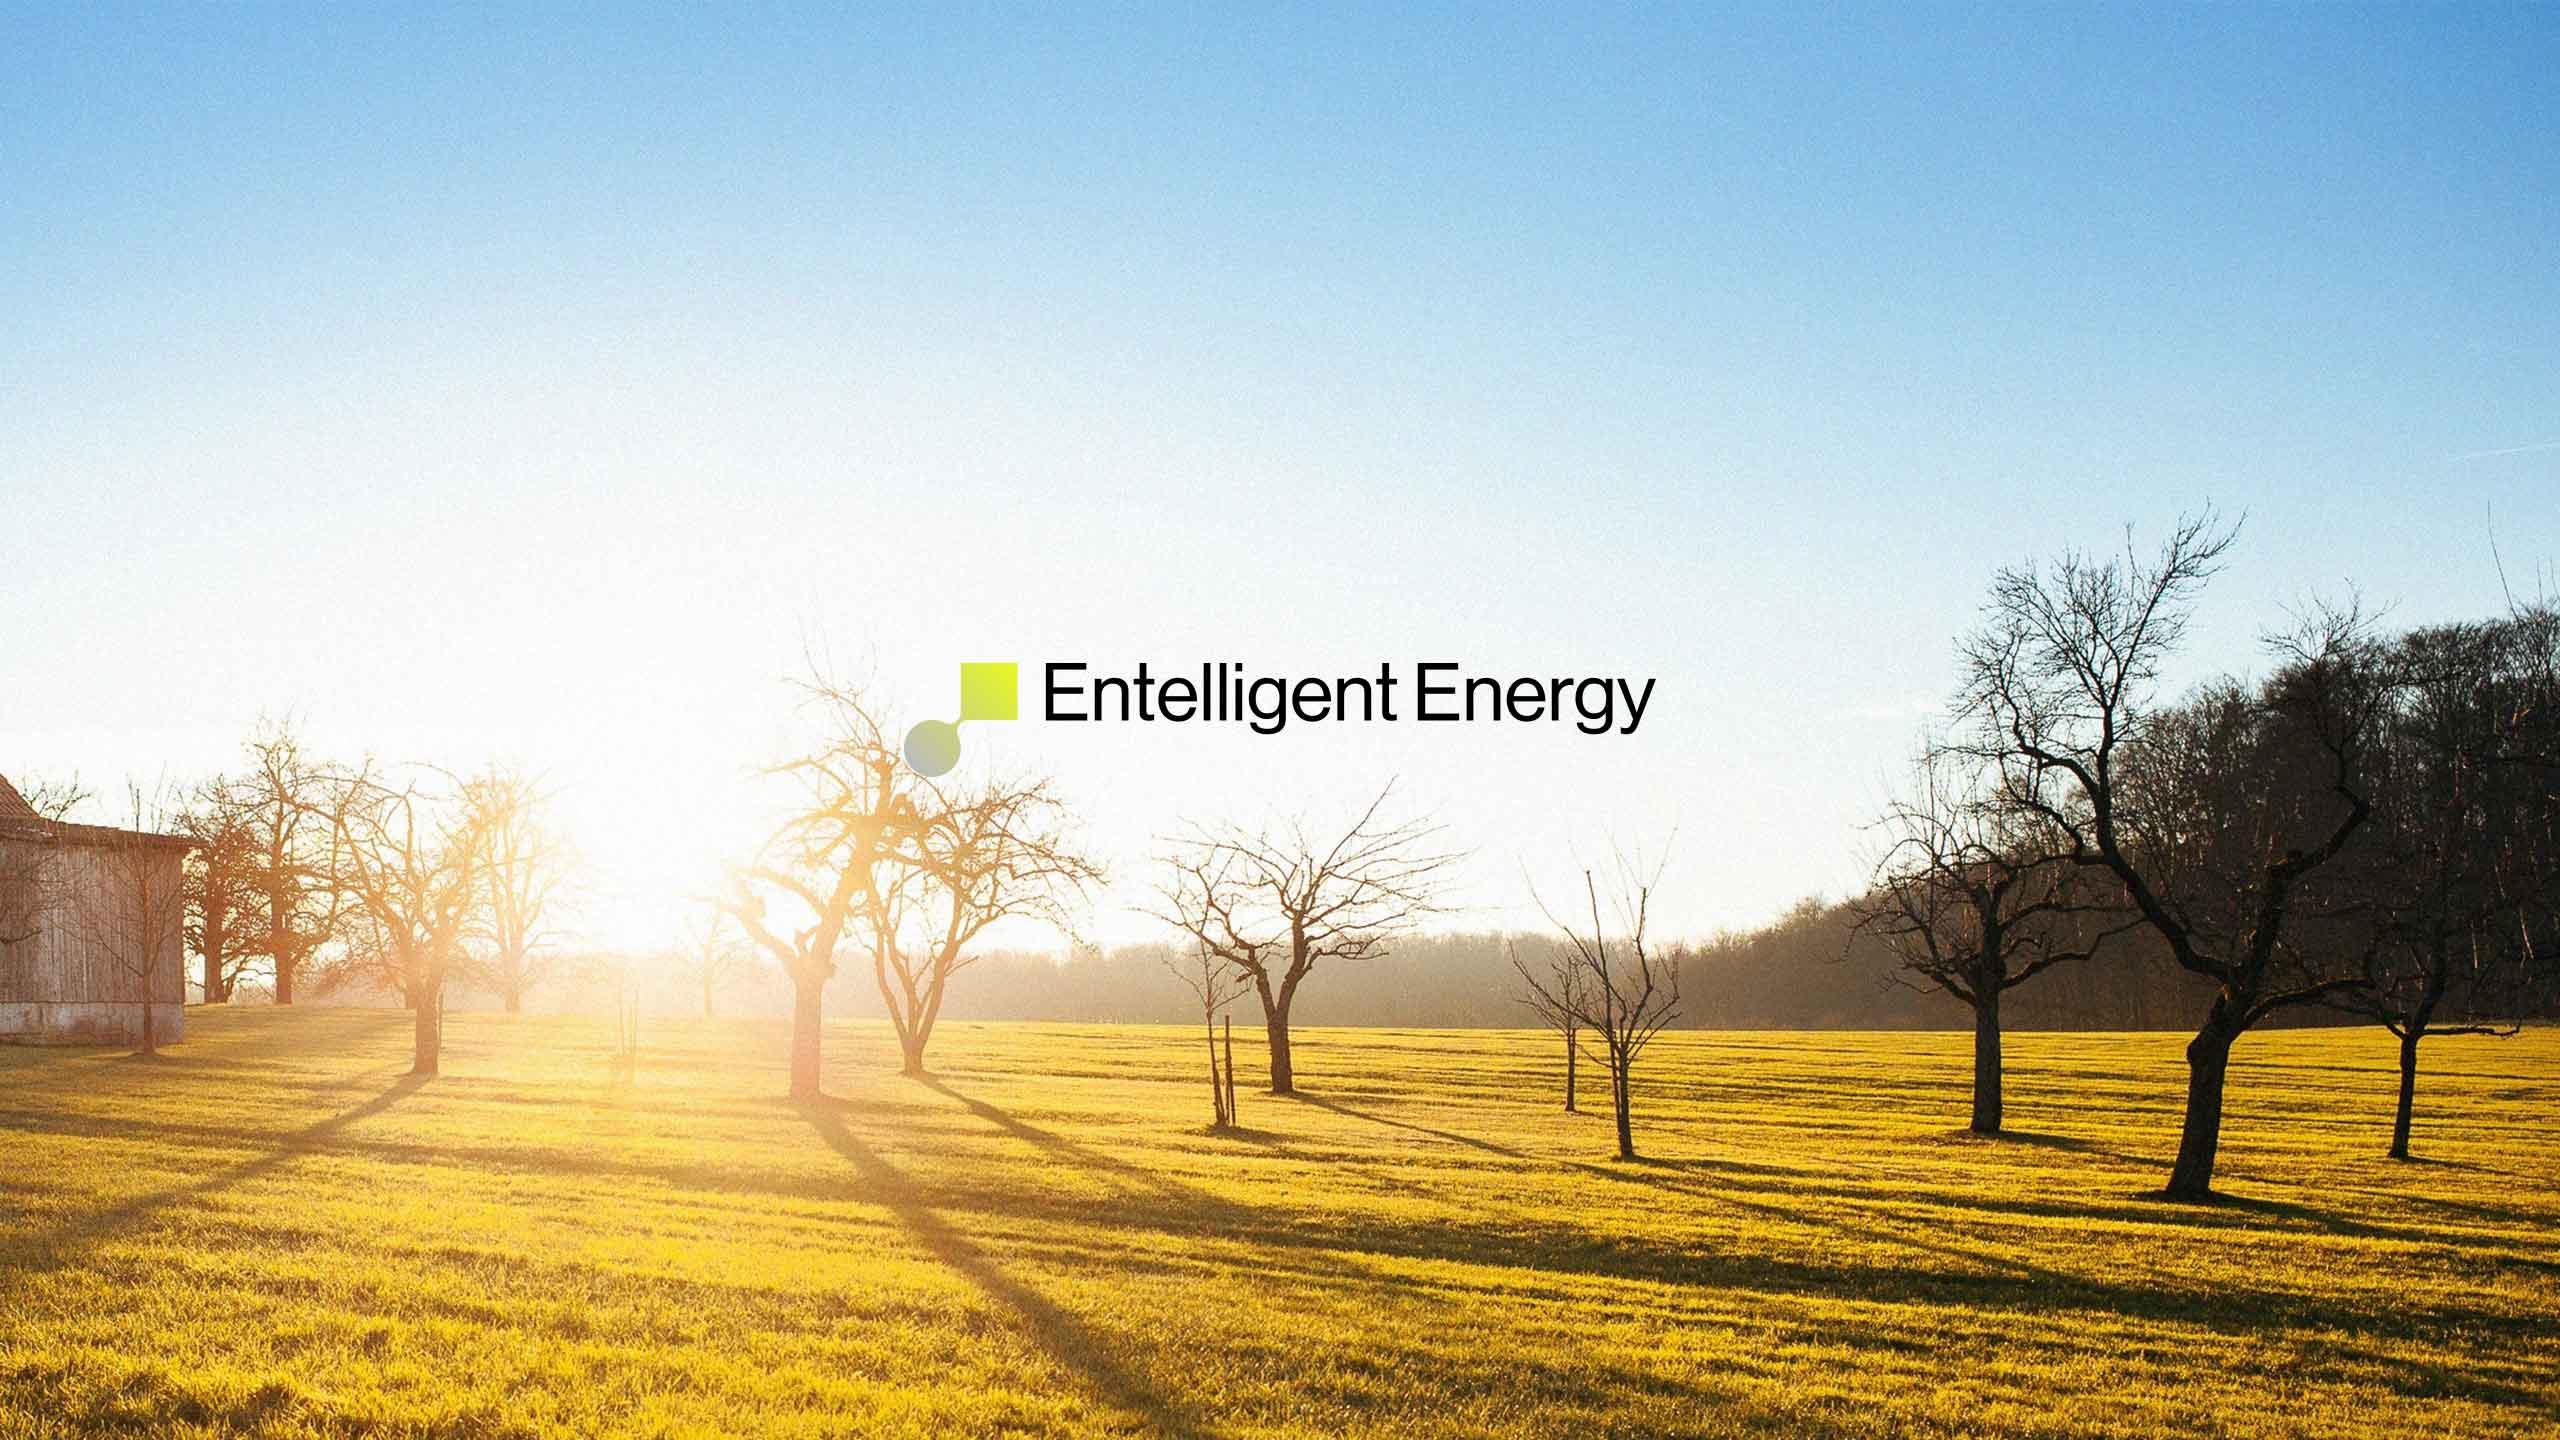 Entelligent-Energy-07d